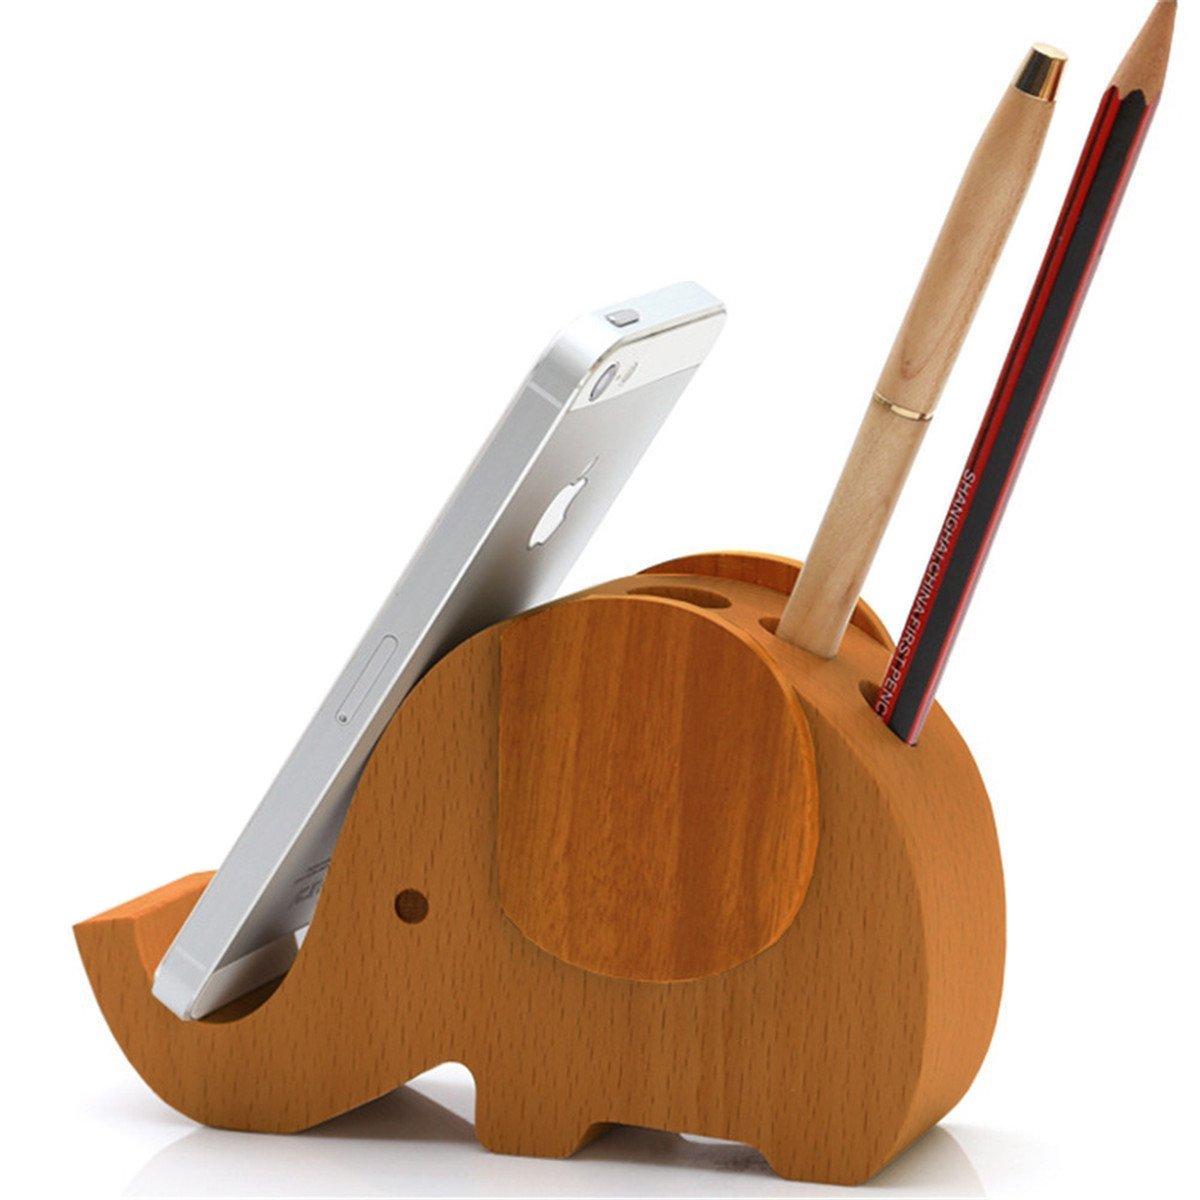 APSOONSELL Wood Elephant Phone Holder & Cute Desktop Card, Note Pad, Pencil Organizer